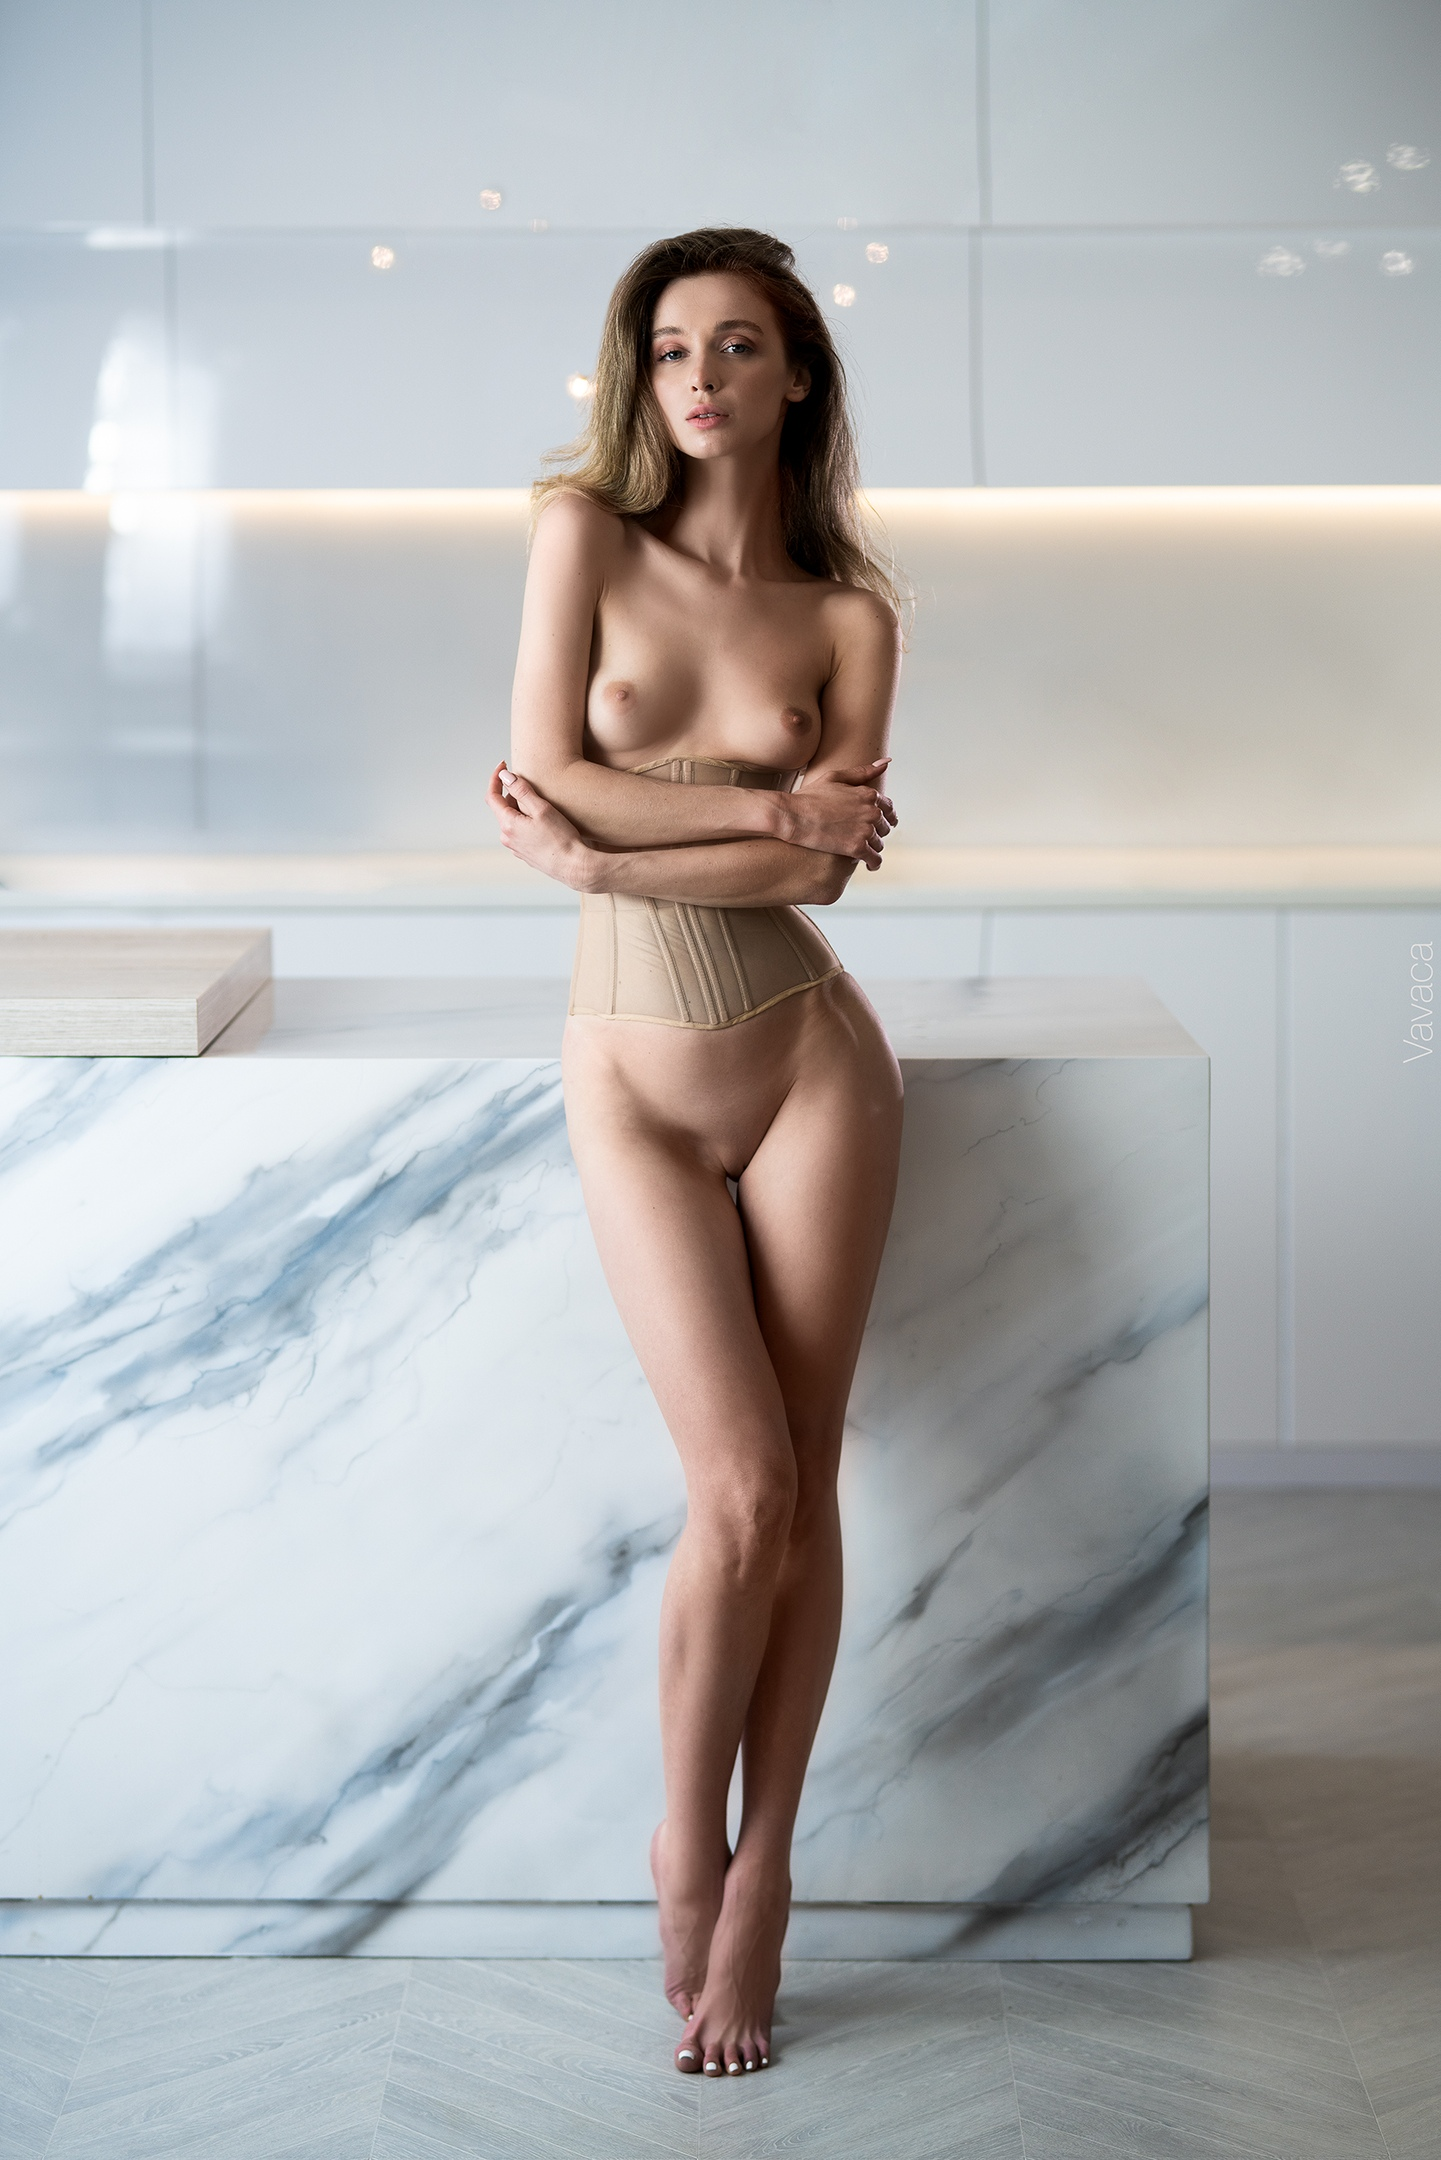 Anna Tsaralunga 21 @tsara.lunga